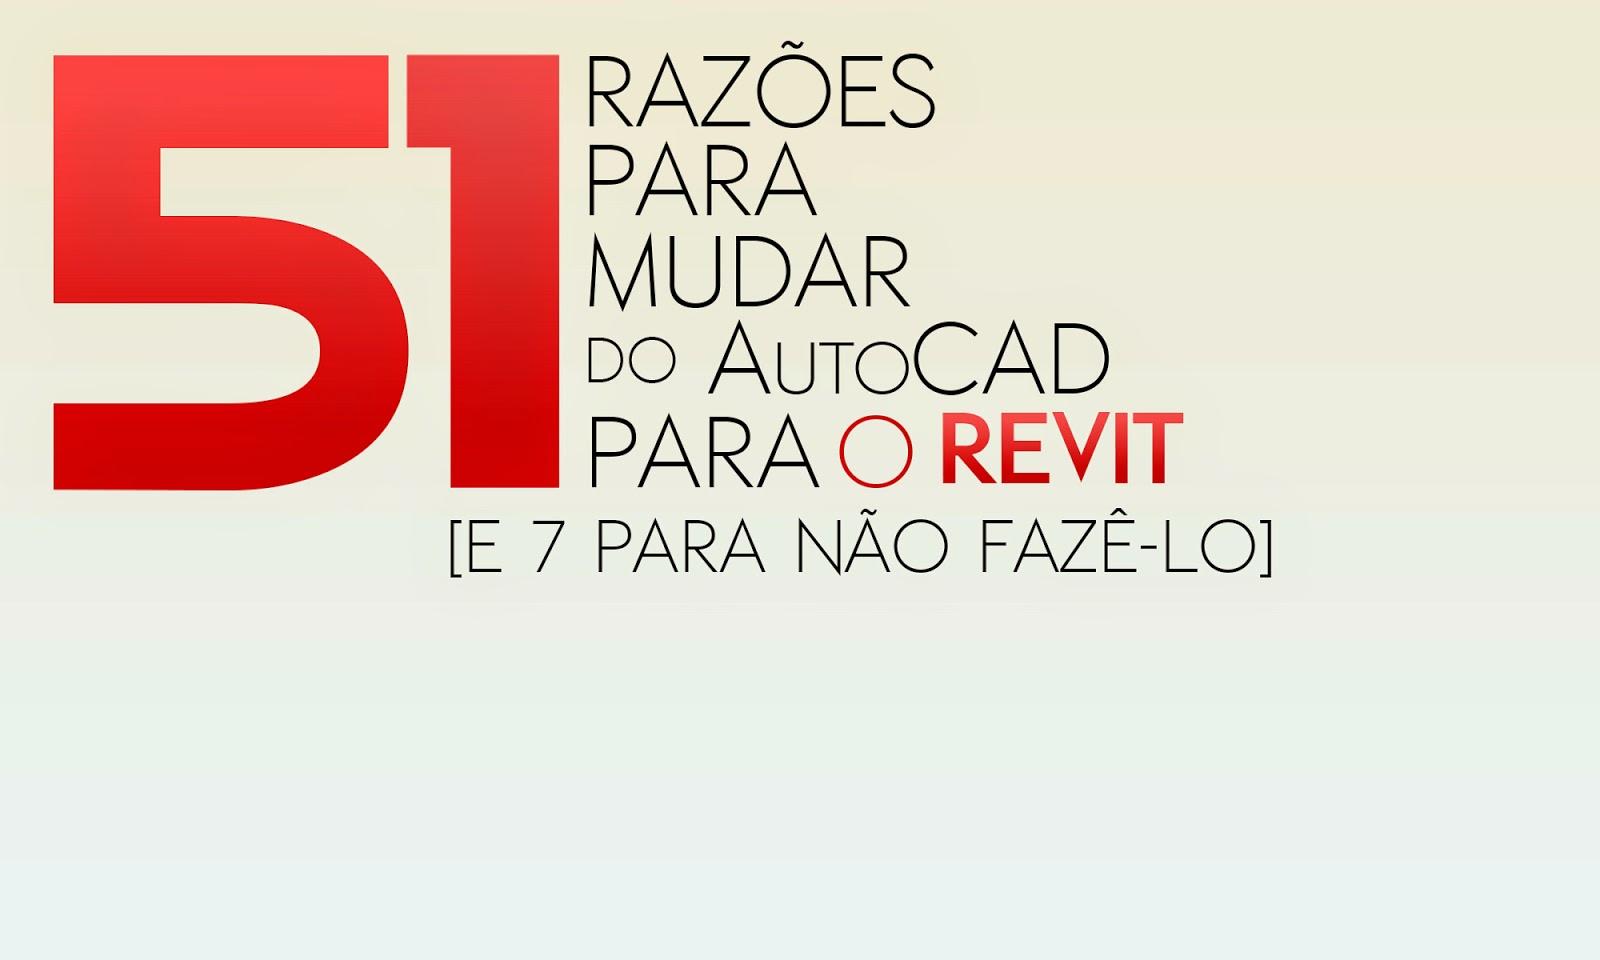 51 Razões_logo